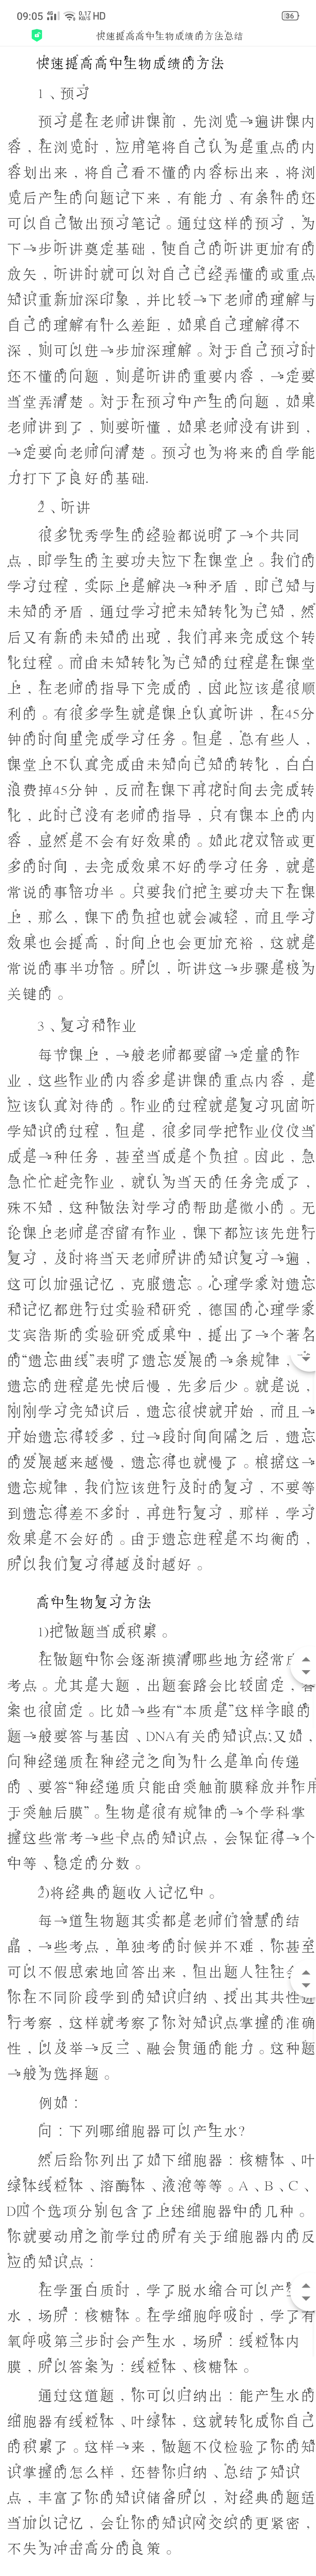 Screenshot_2019-07-26-09-06-02-00.png